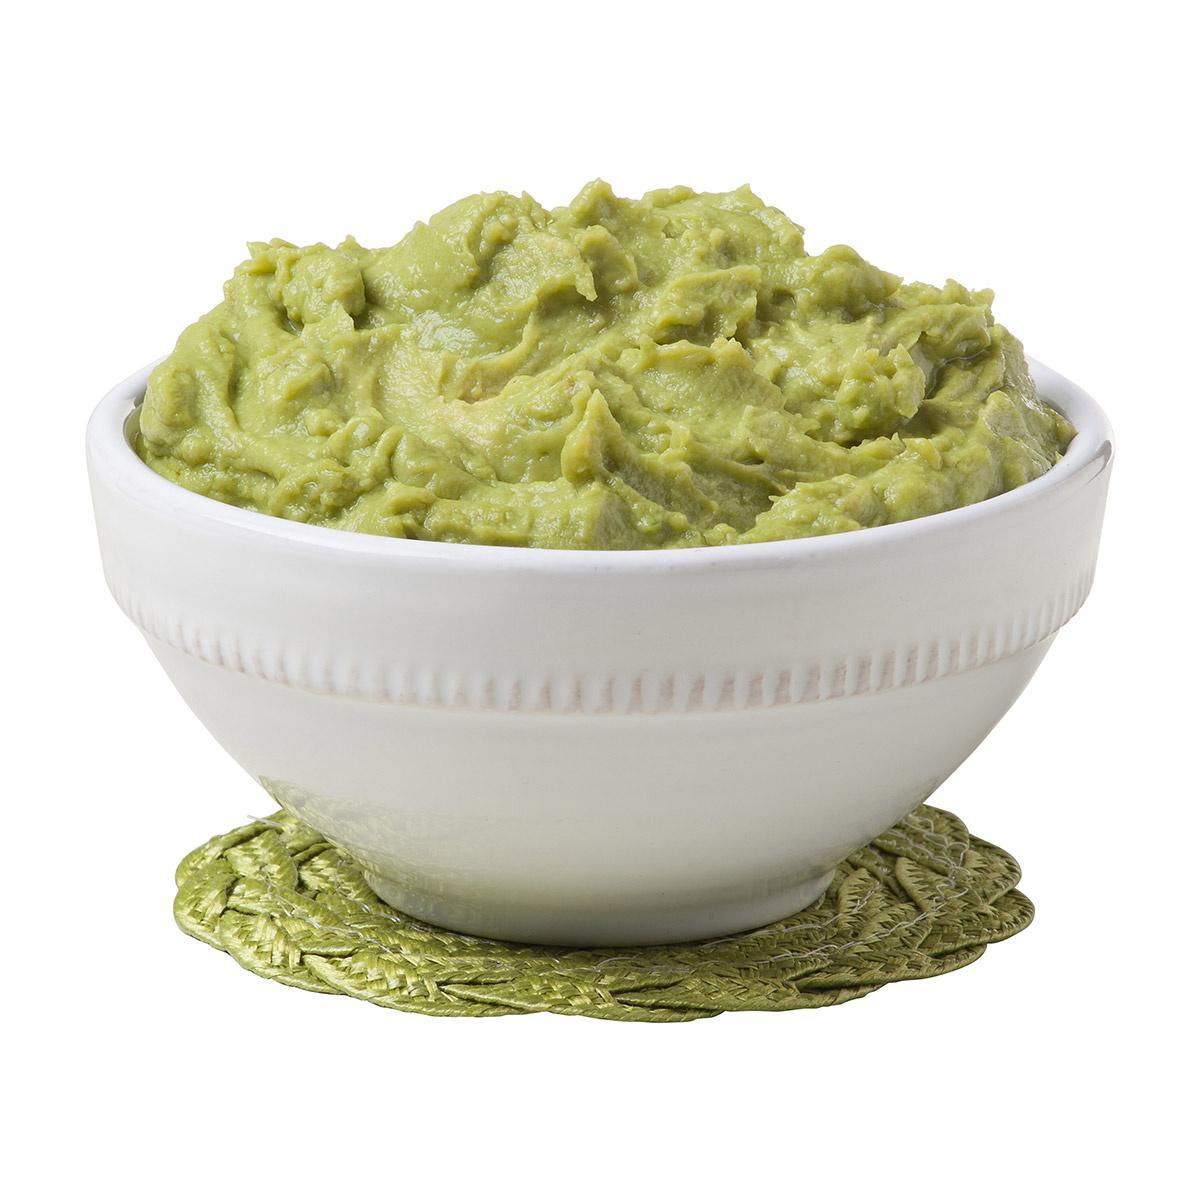 image of GUACAMOLE FRESH ORIG BLEND HPP